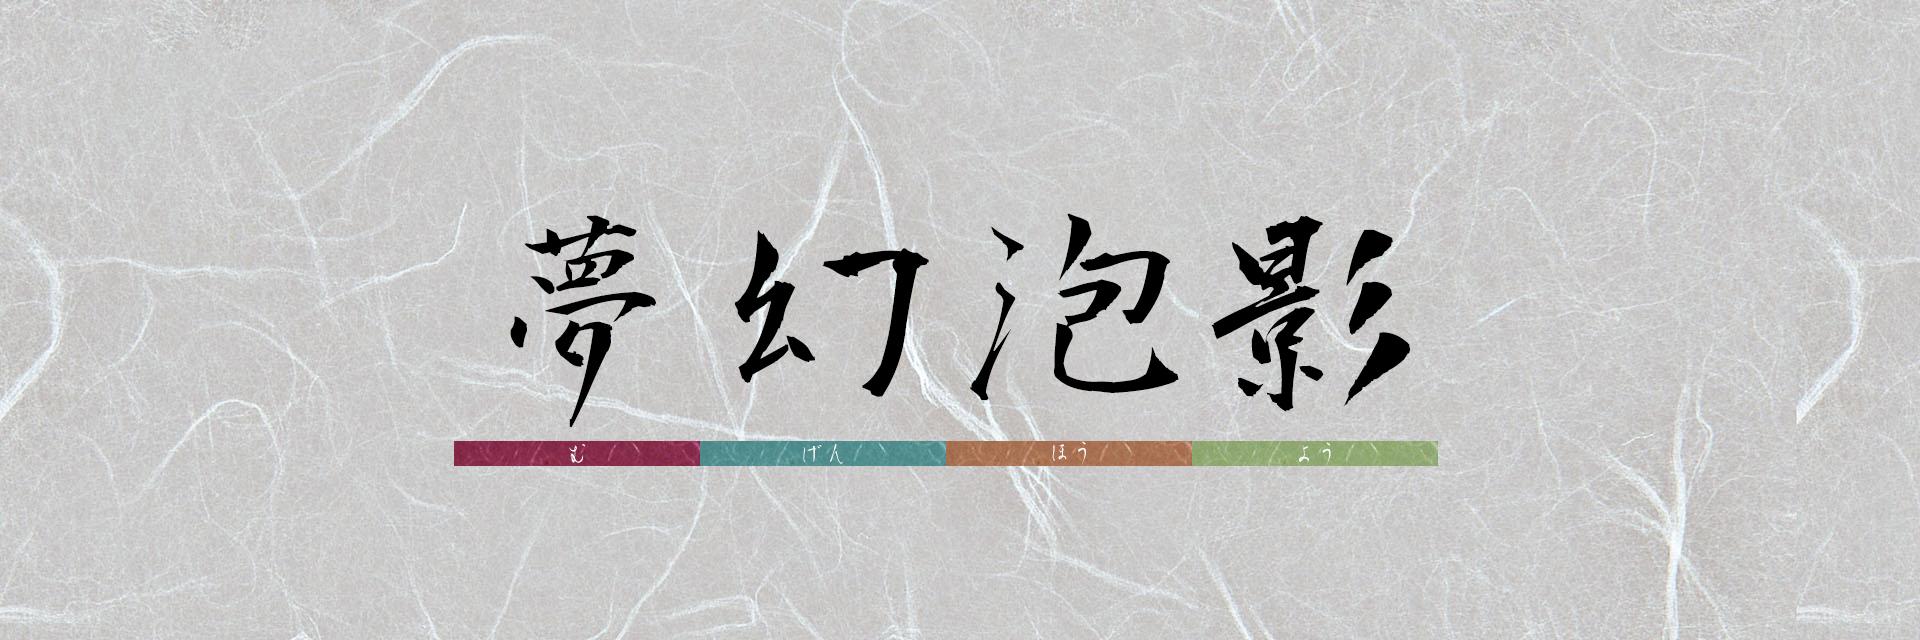 http://夢幻泡影